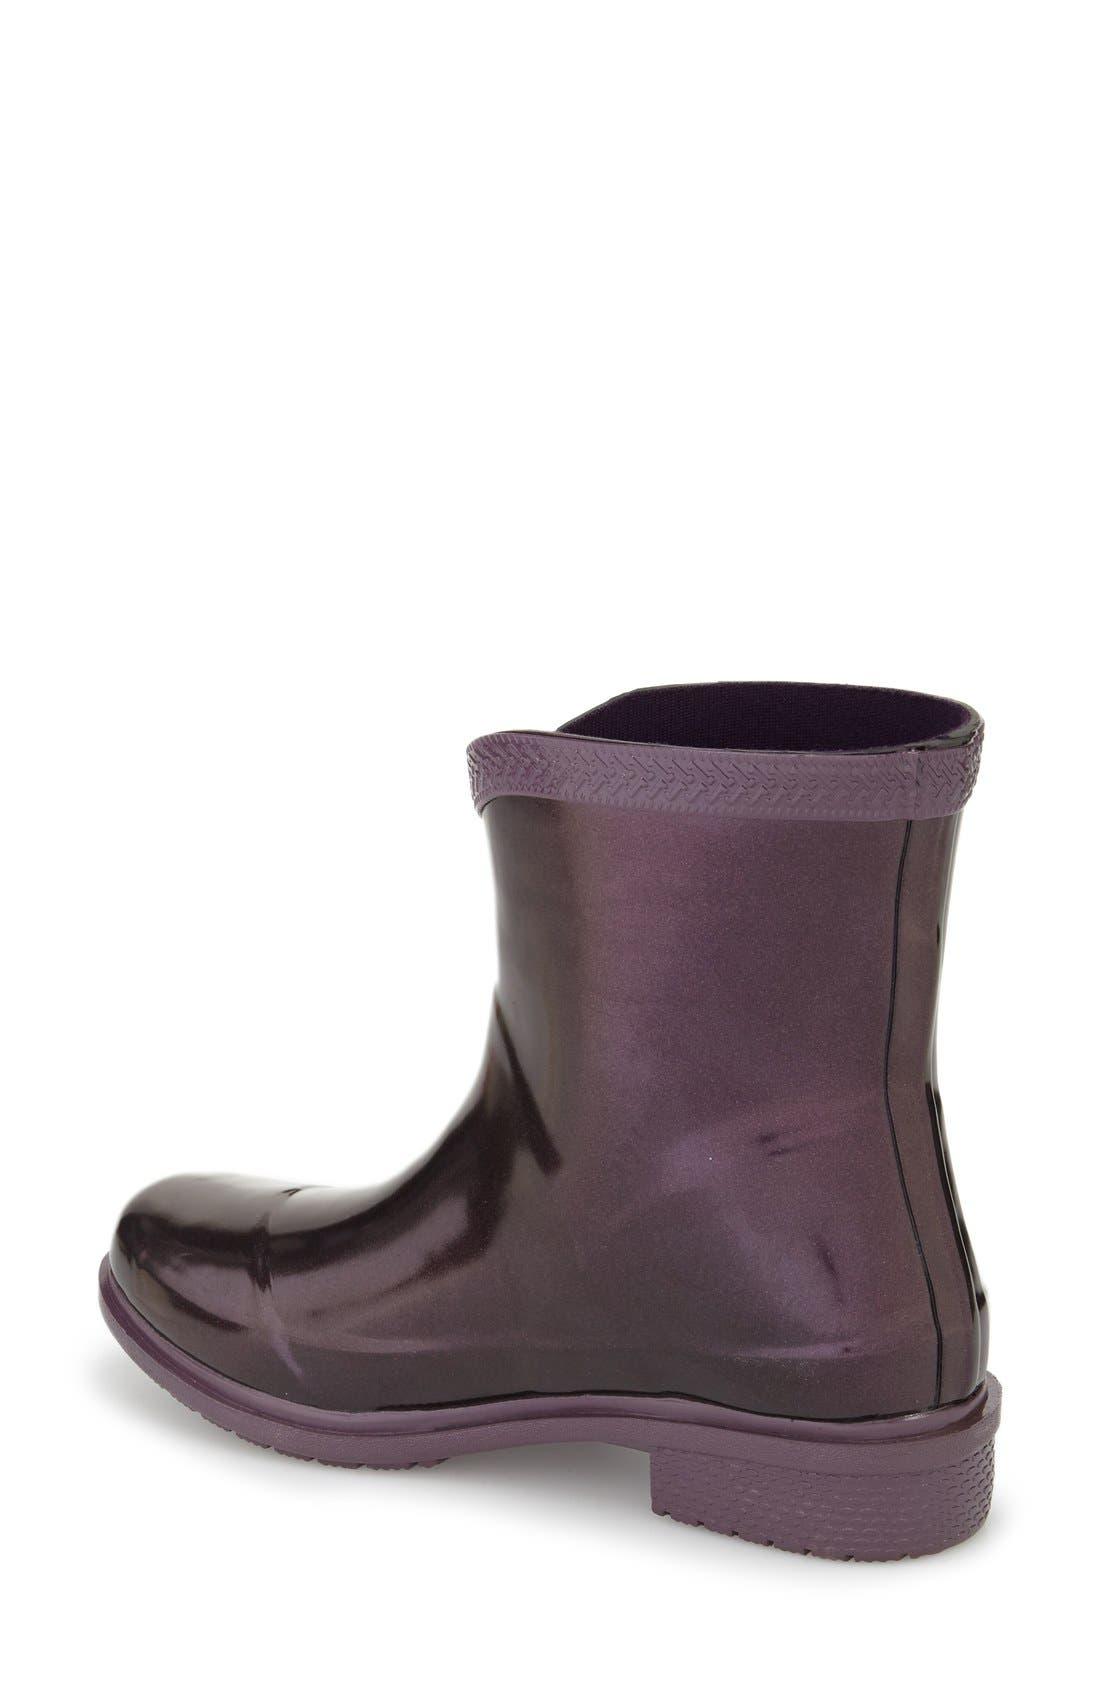 Alternate Image 2  - Havaianas 'Galochas Low Metallic' Waterproof Rain Boot (Women)